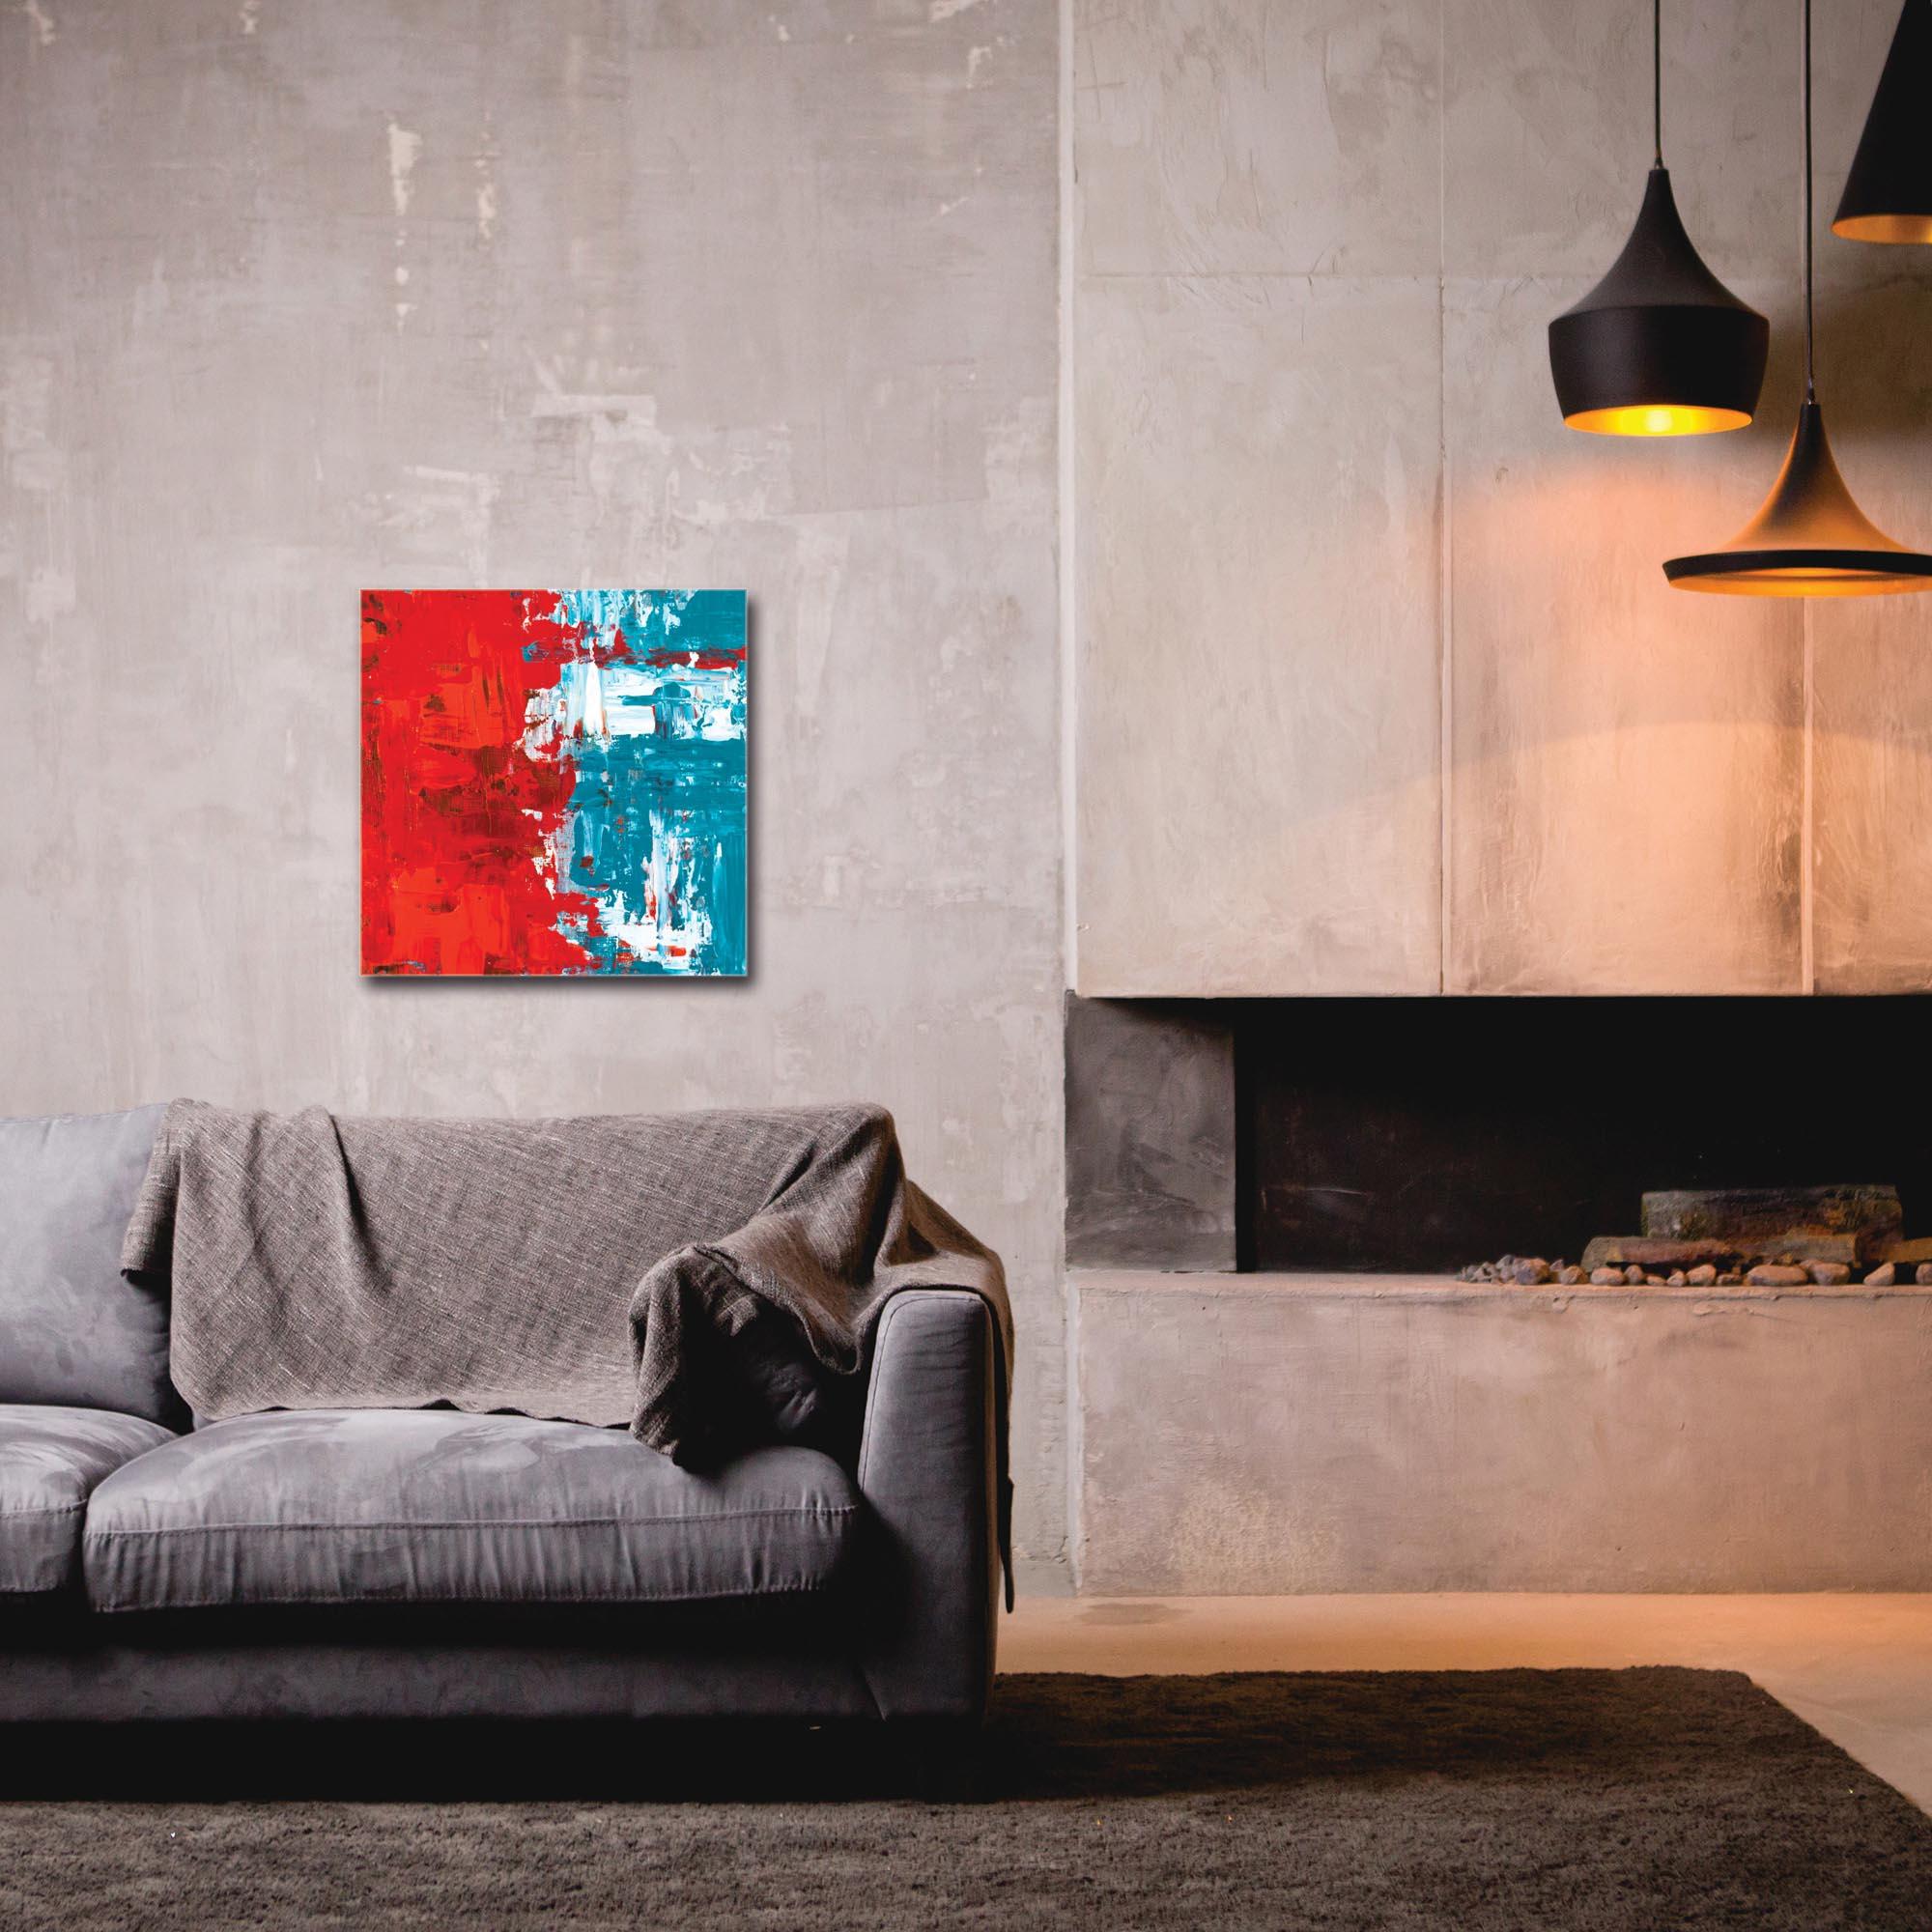 Abstract Wall Art 'Urban Life 13' - Urban Decor on Metal or Plexiglass - Image 3